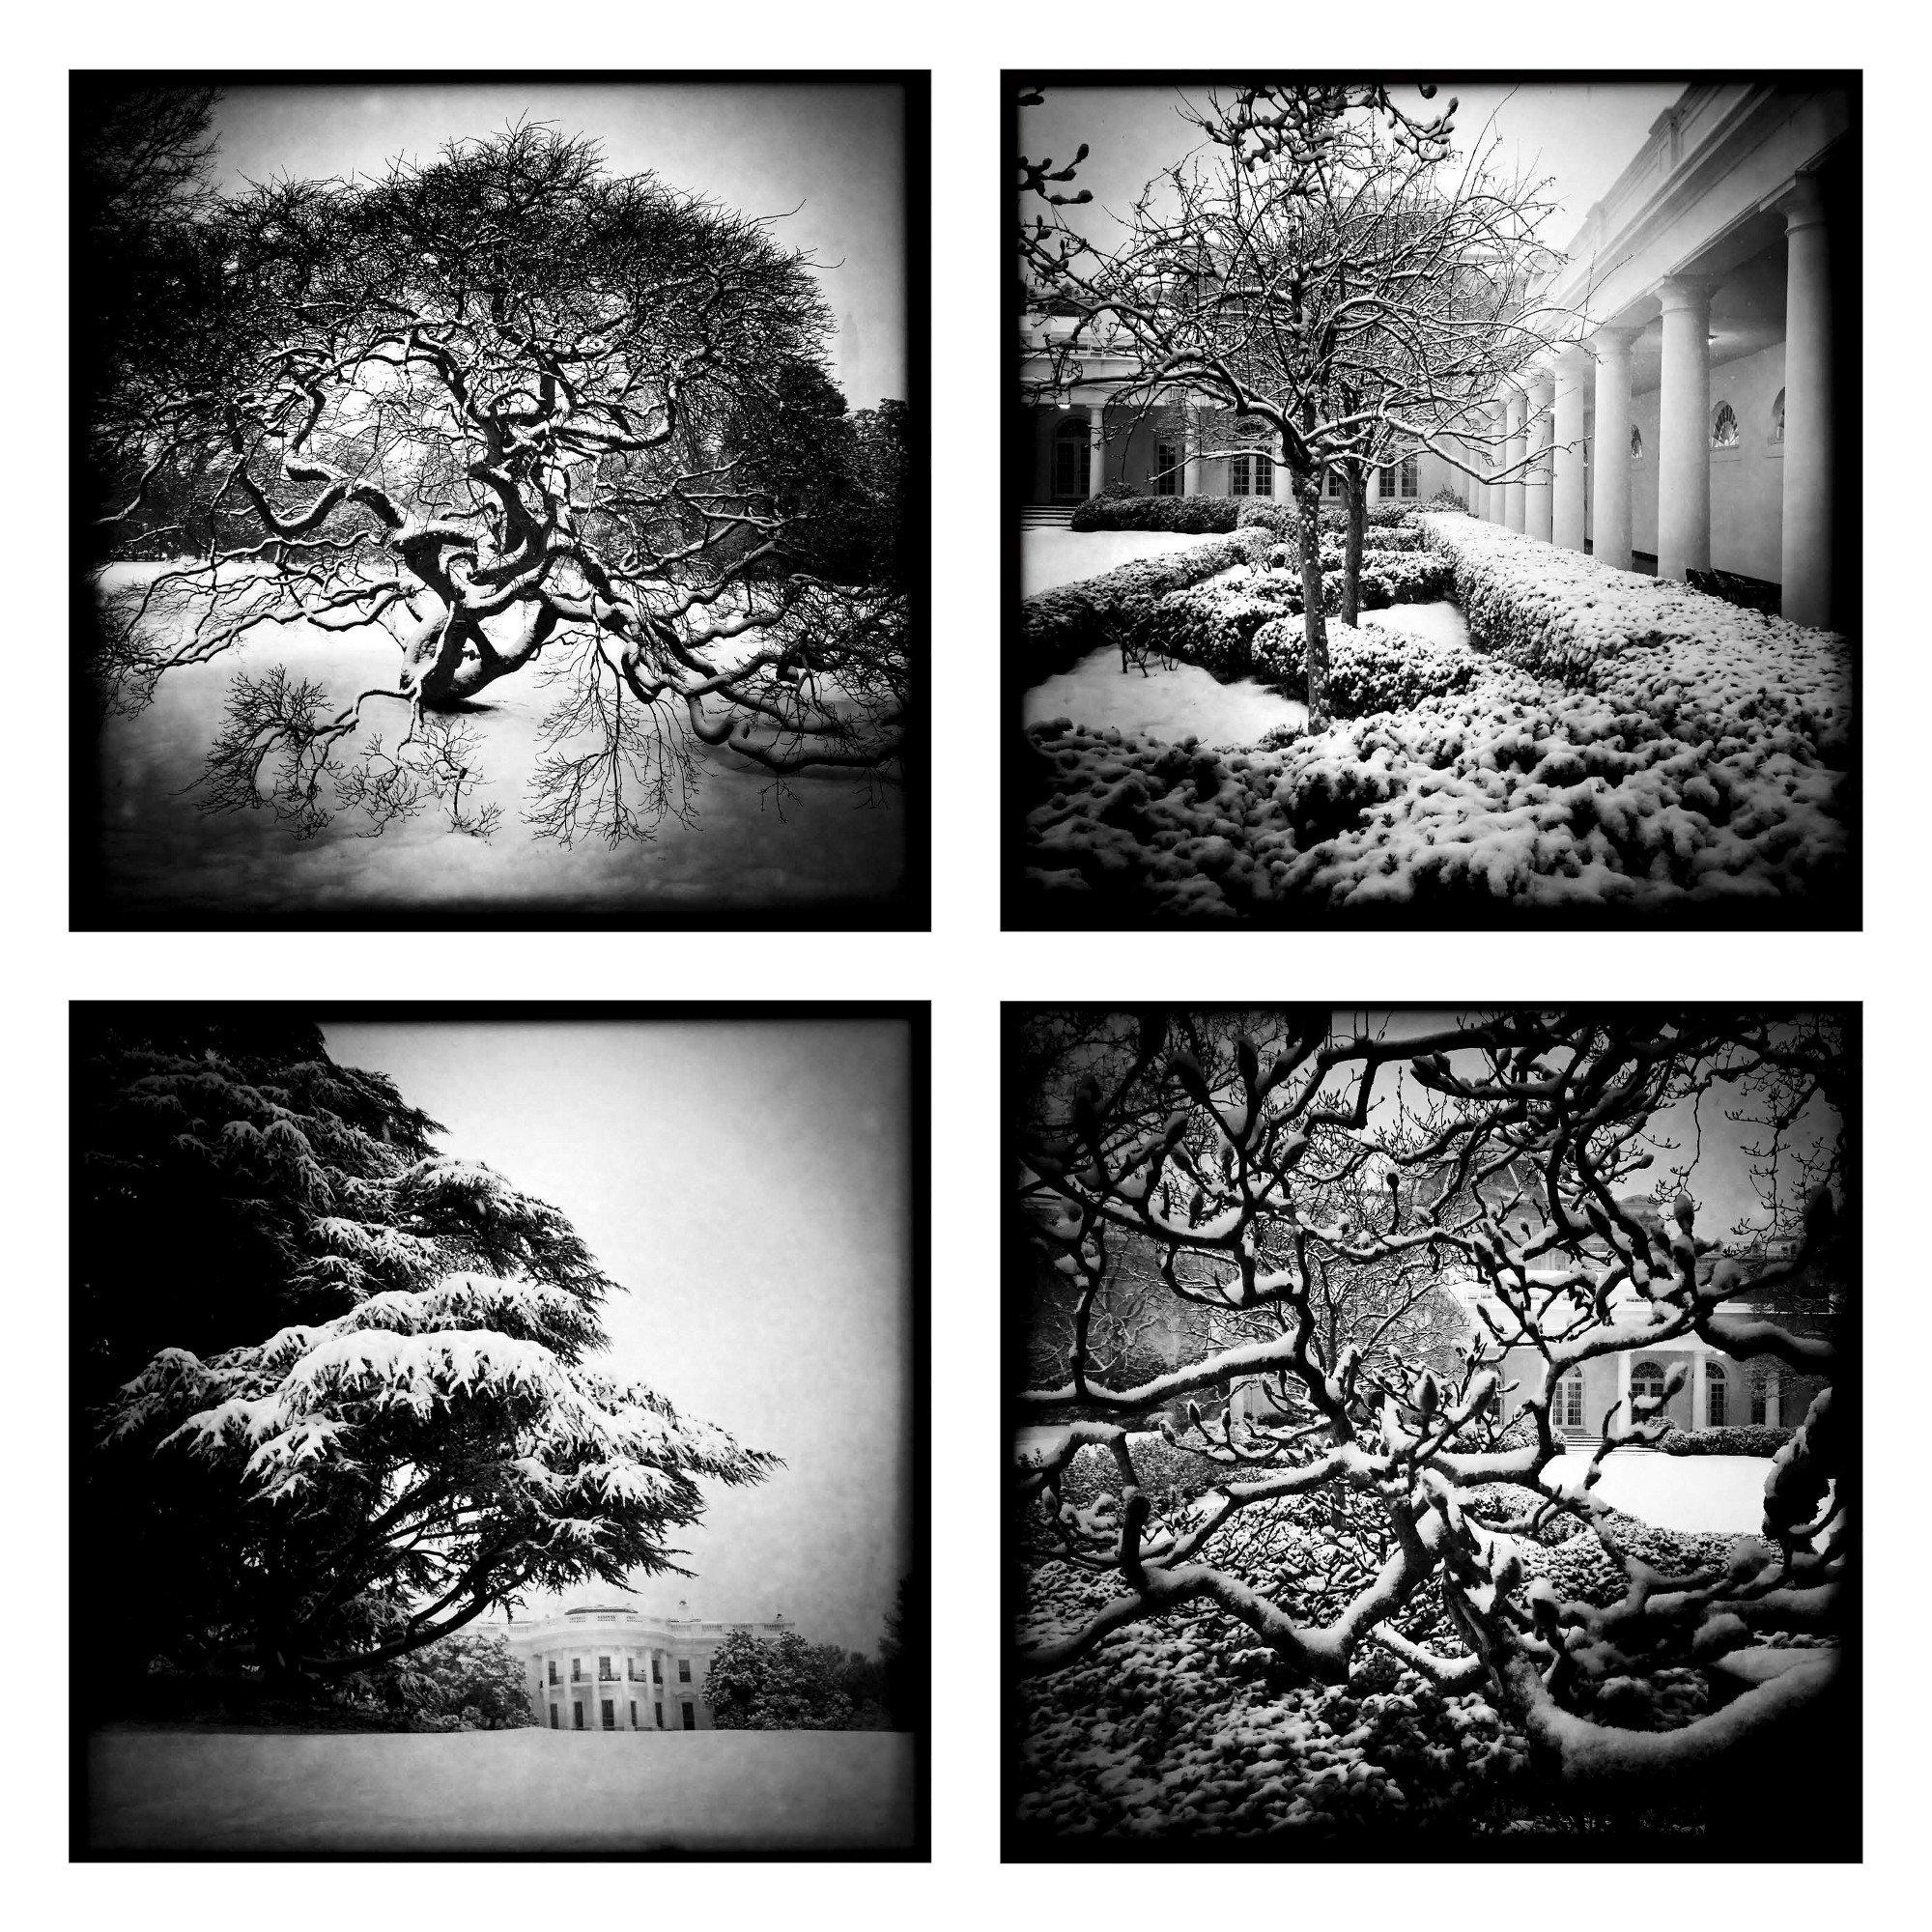 Snow scenes using the Hipstamatic app